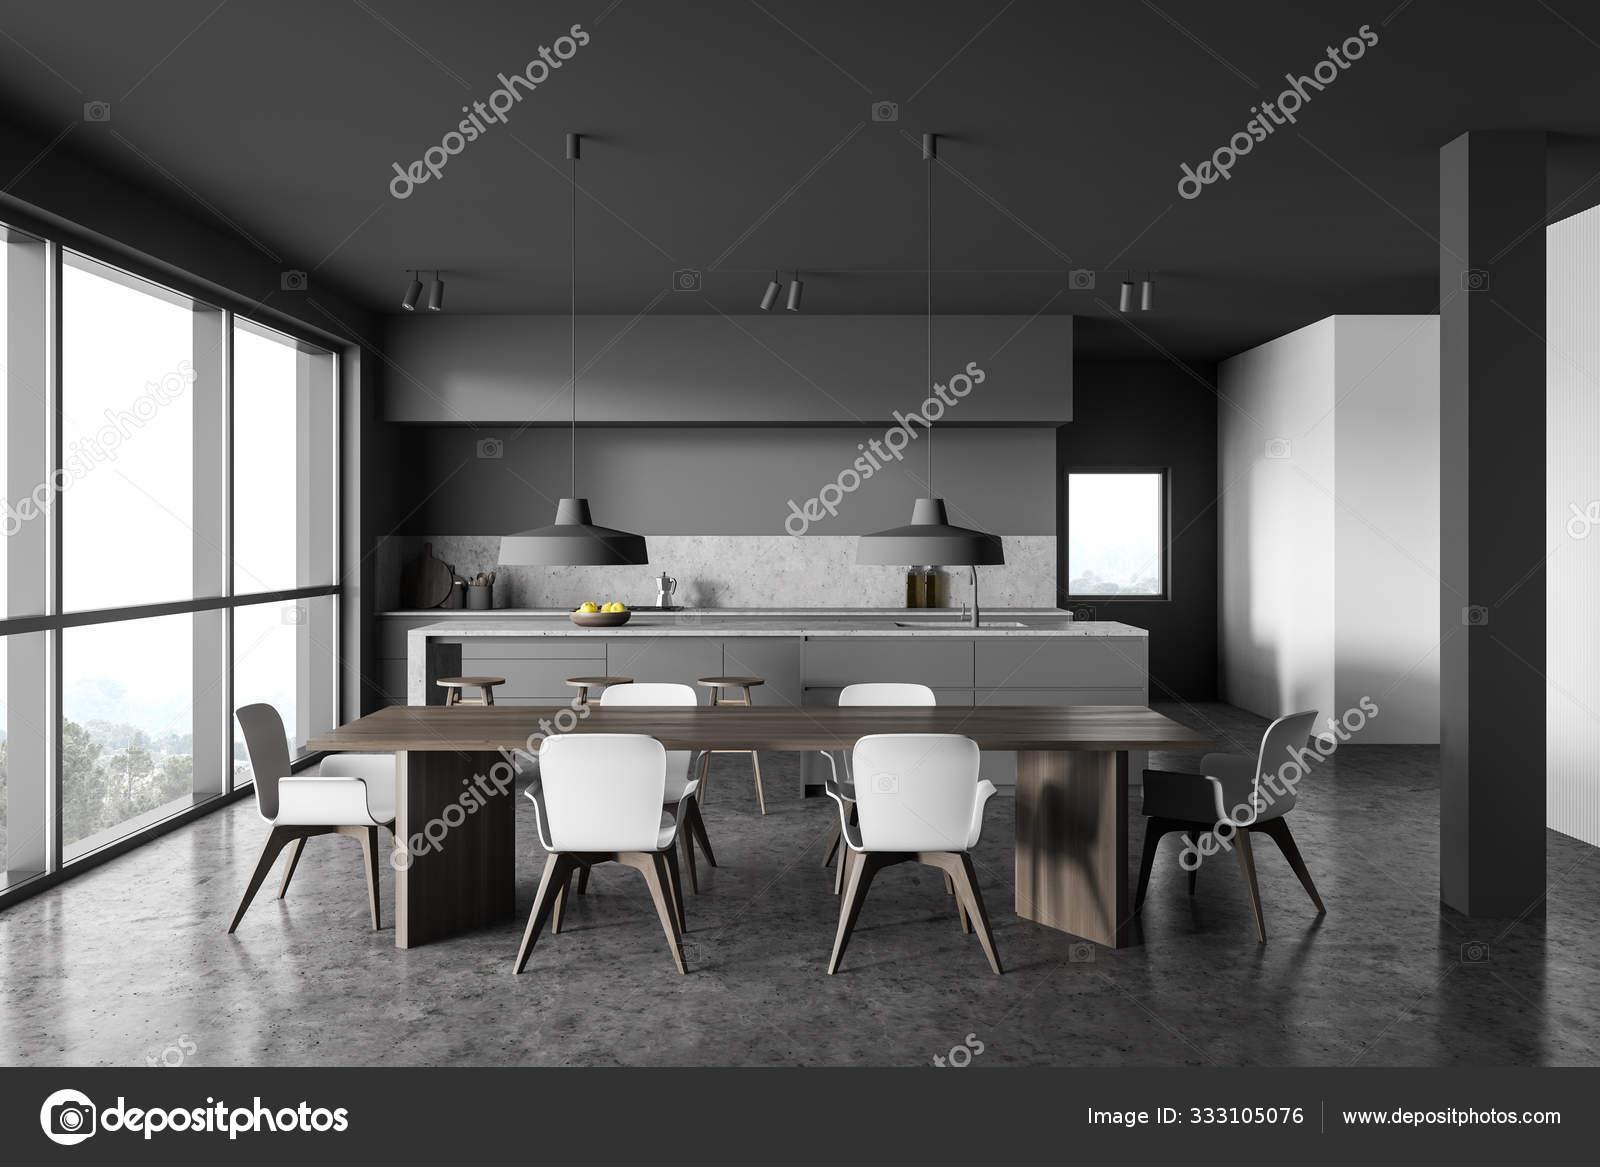 Gray And White Kitchen Interior With Table Stock Photo C Denisismagilov 333105076